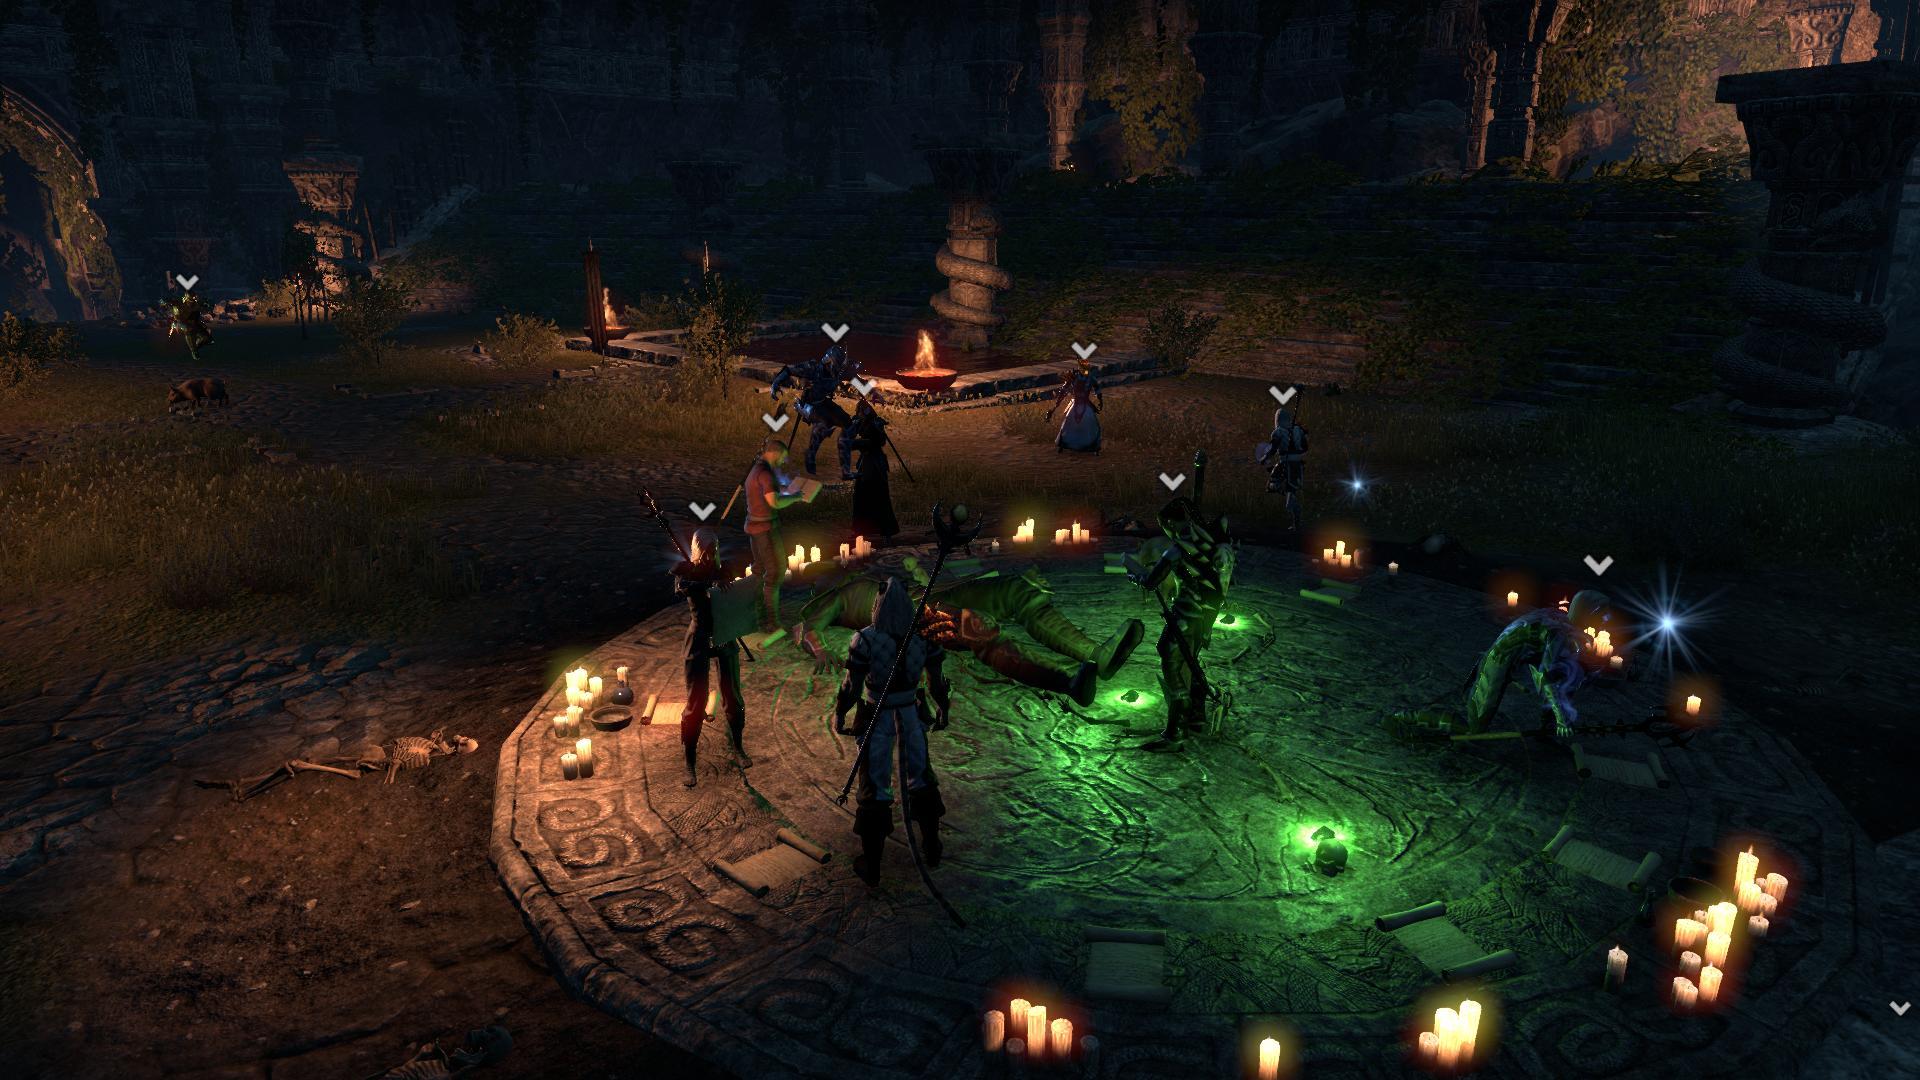 Elder Scrolls Online - Sanctum Farming Exploit Guide - Just